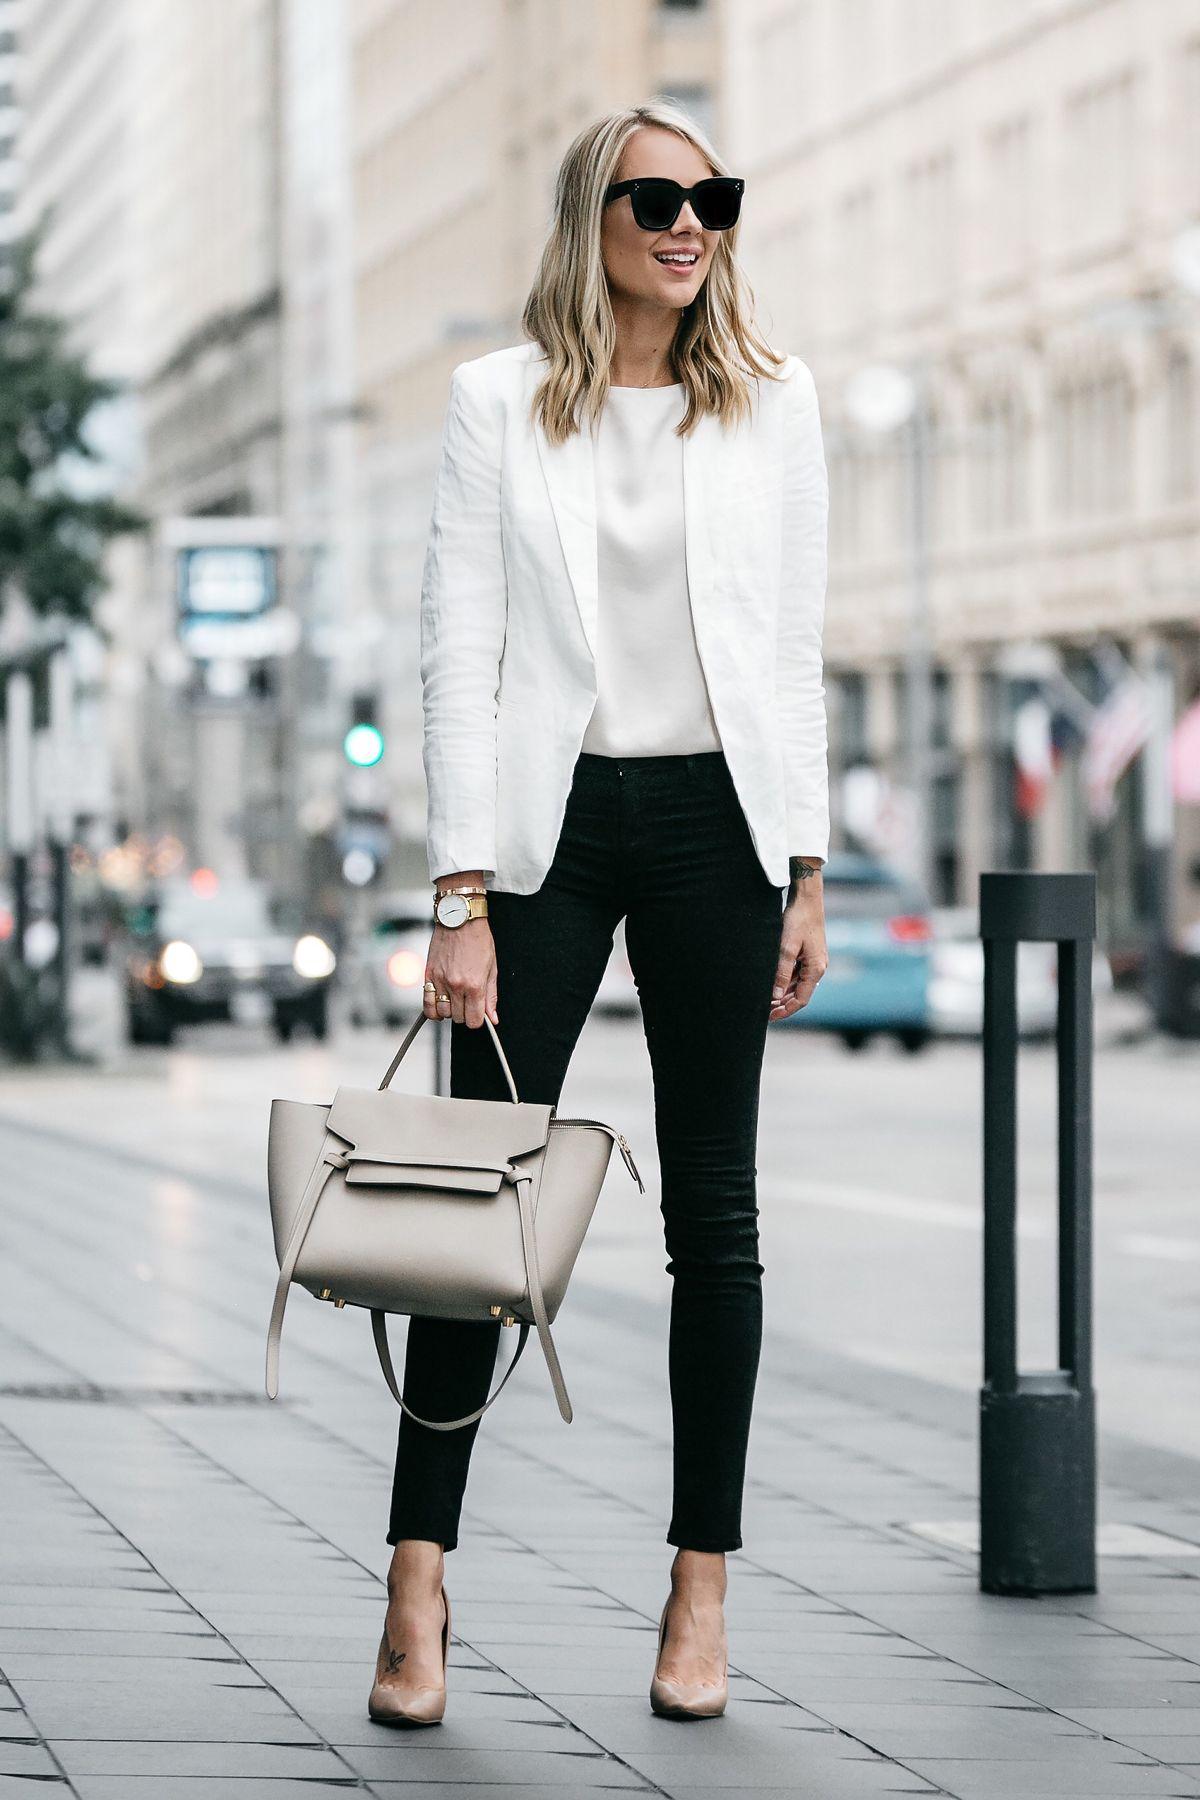 Blonde Woman Wearing Stitch Fix Outfit Joie White Blazer J Brand Black  Skinny Jeans Nude Pumps Celine Belt Handbag Fashion Jackson Dallas Blogger  Fashion ...